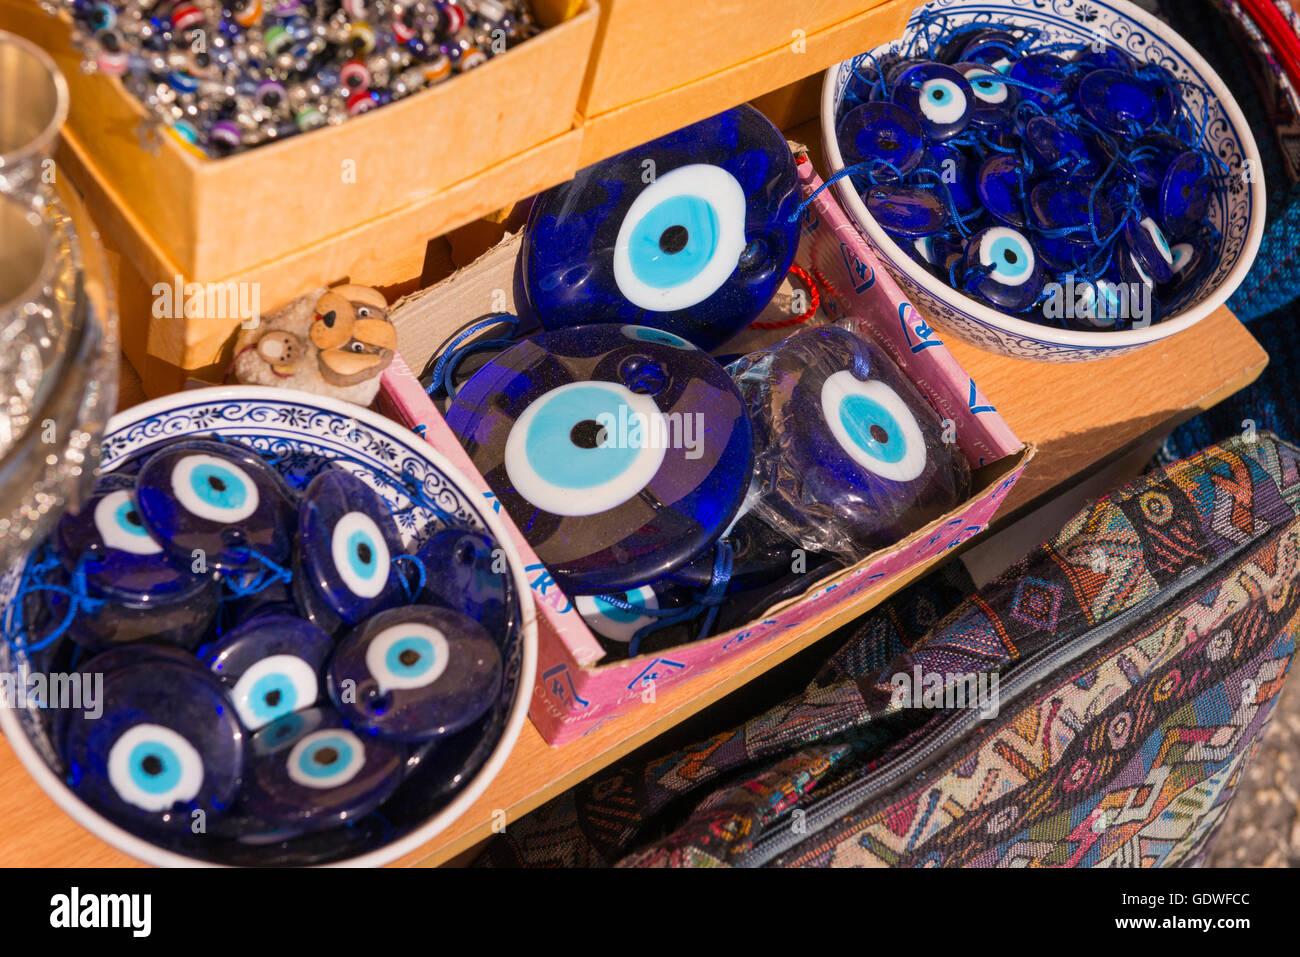 Evil eye stock photos evil eye stock images alamy israel jerusalem old city armenian district souvenir shop store pendants of protection against evil eye biocorpaavc